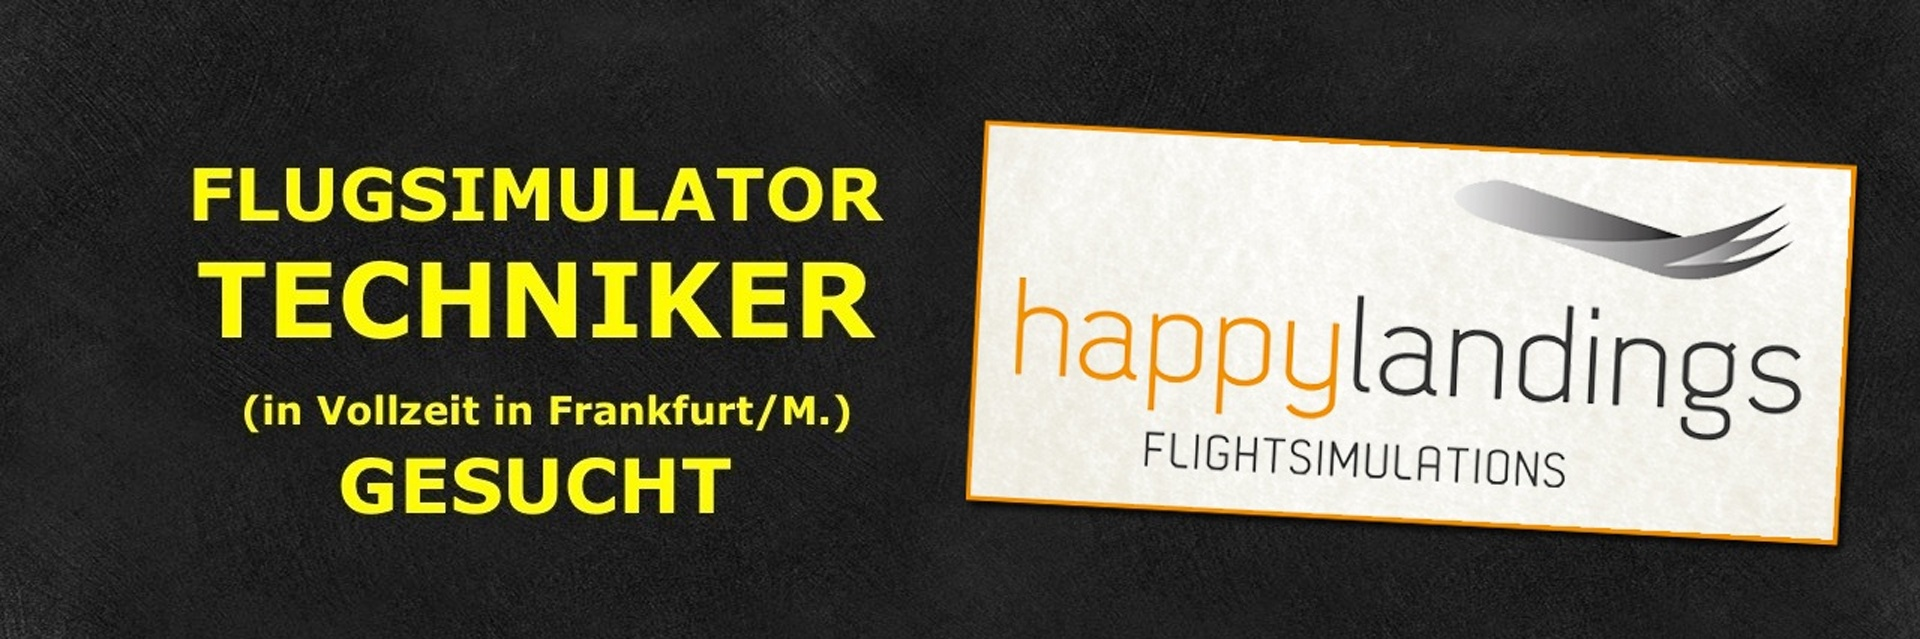 HappyLandings sucht Flugsimulator-Techniker